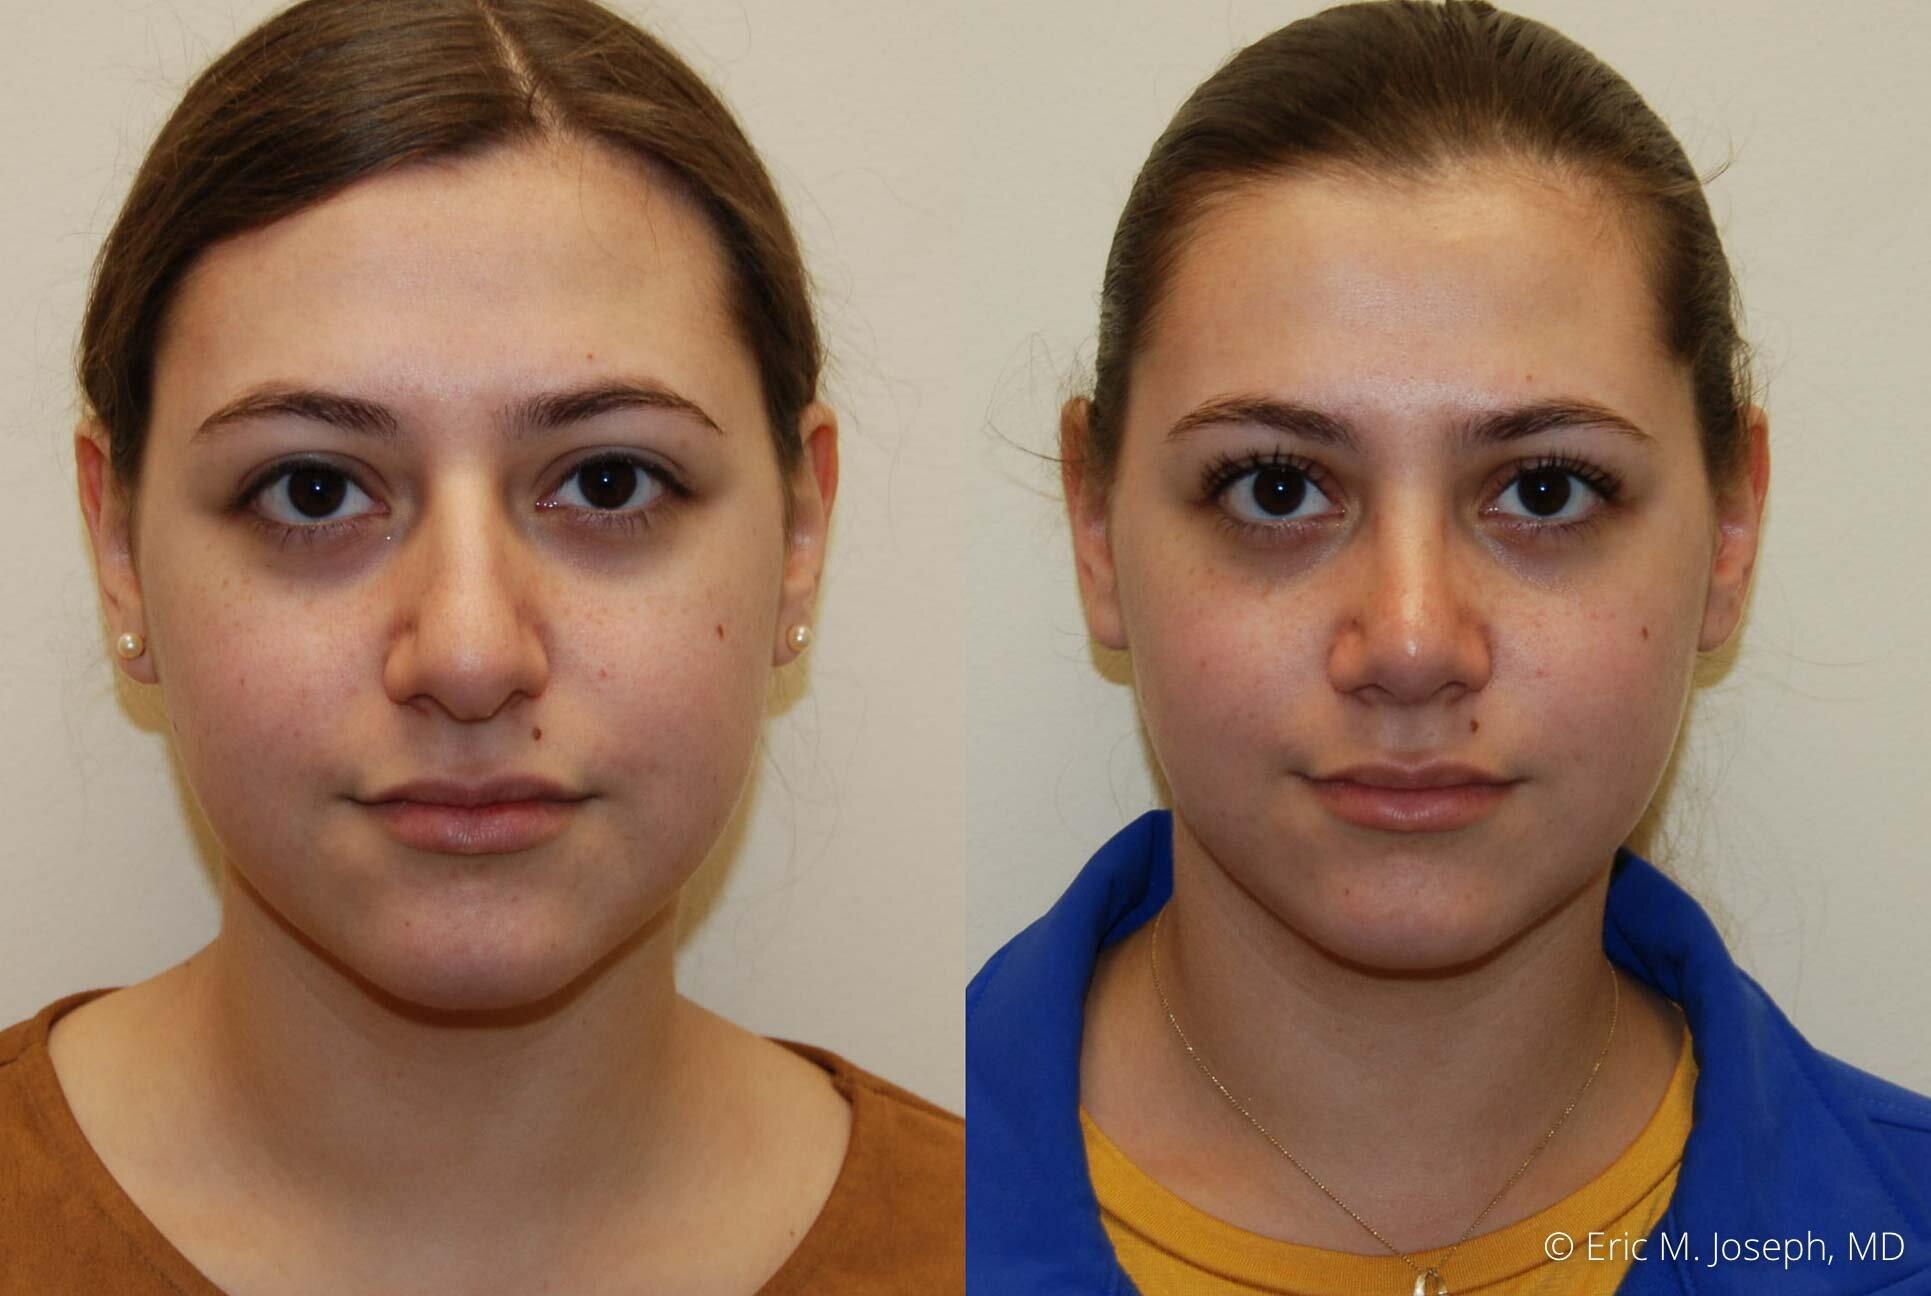 nose-job-rhinoplasty-nj-nyc-0460.jpg